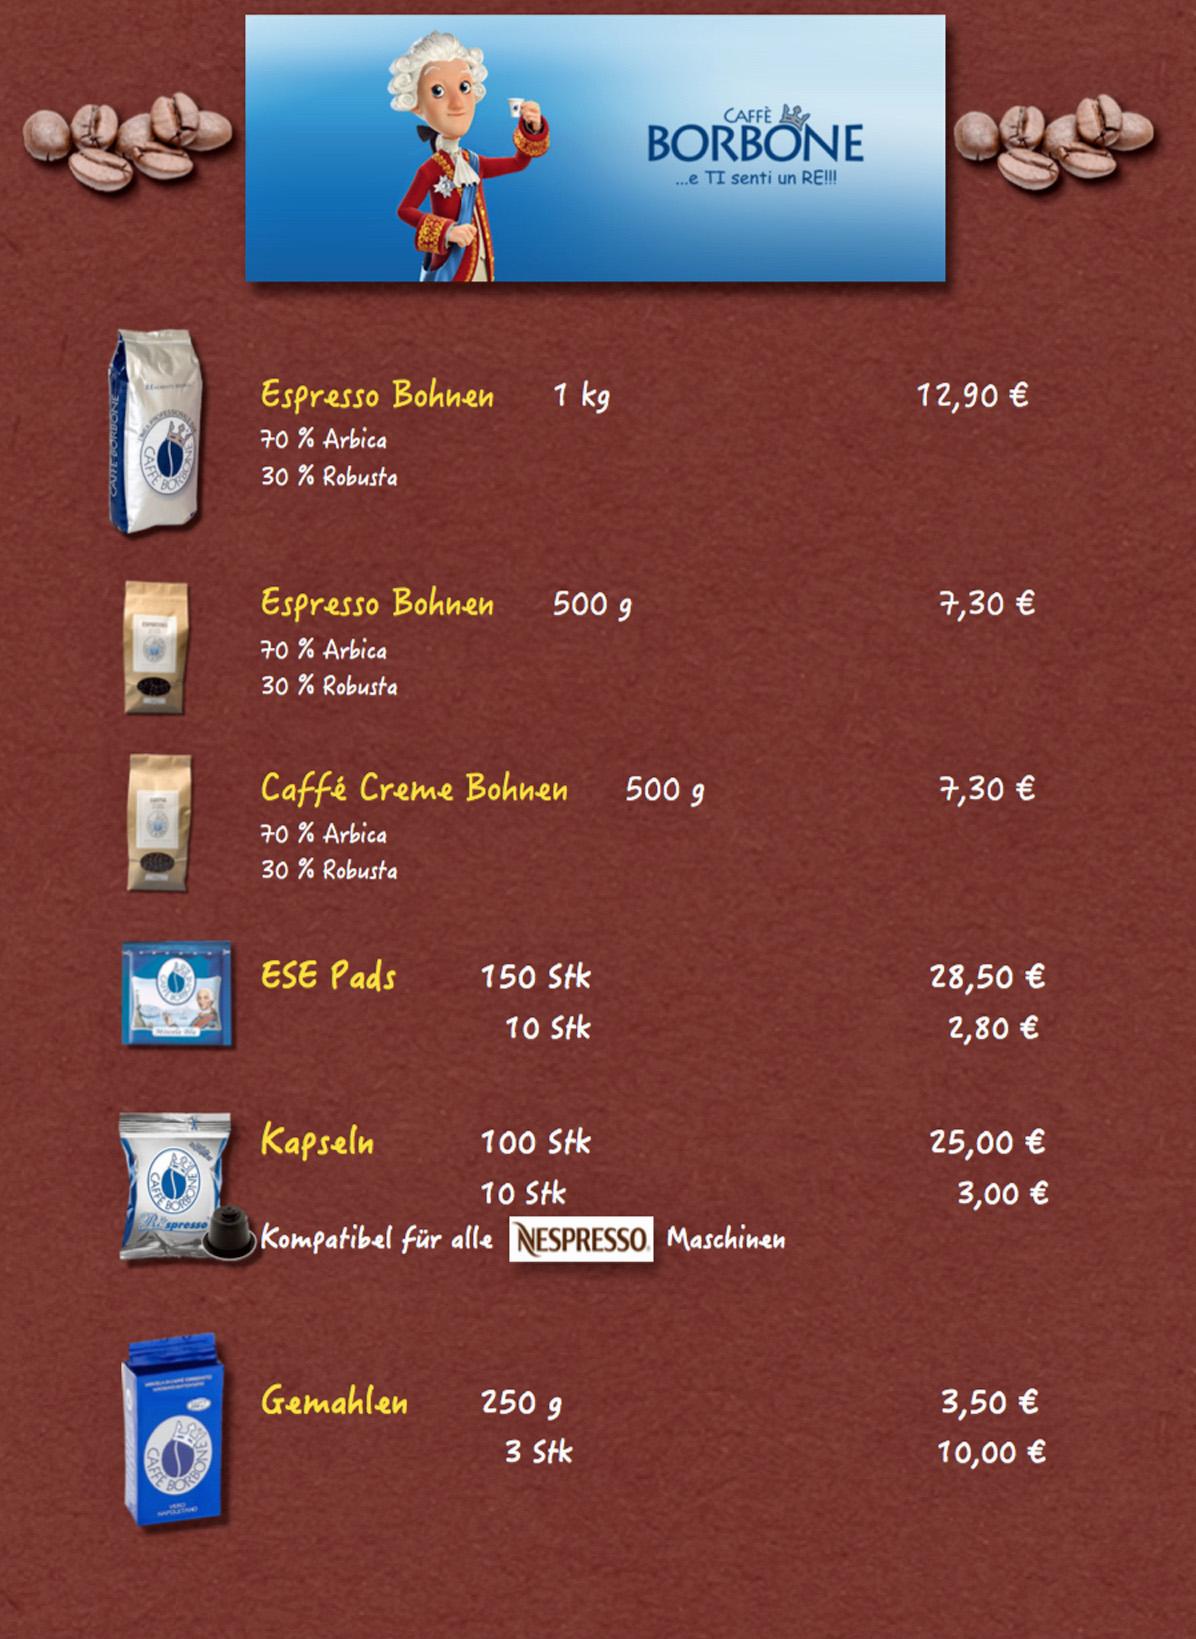 Borbone Liste_bearbeitet-1